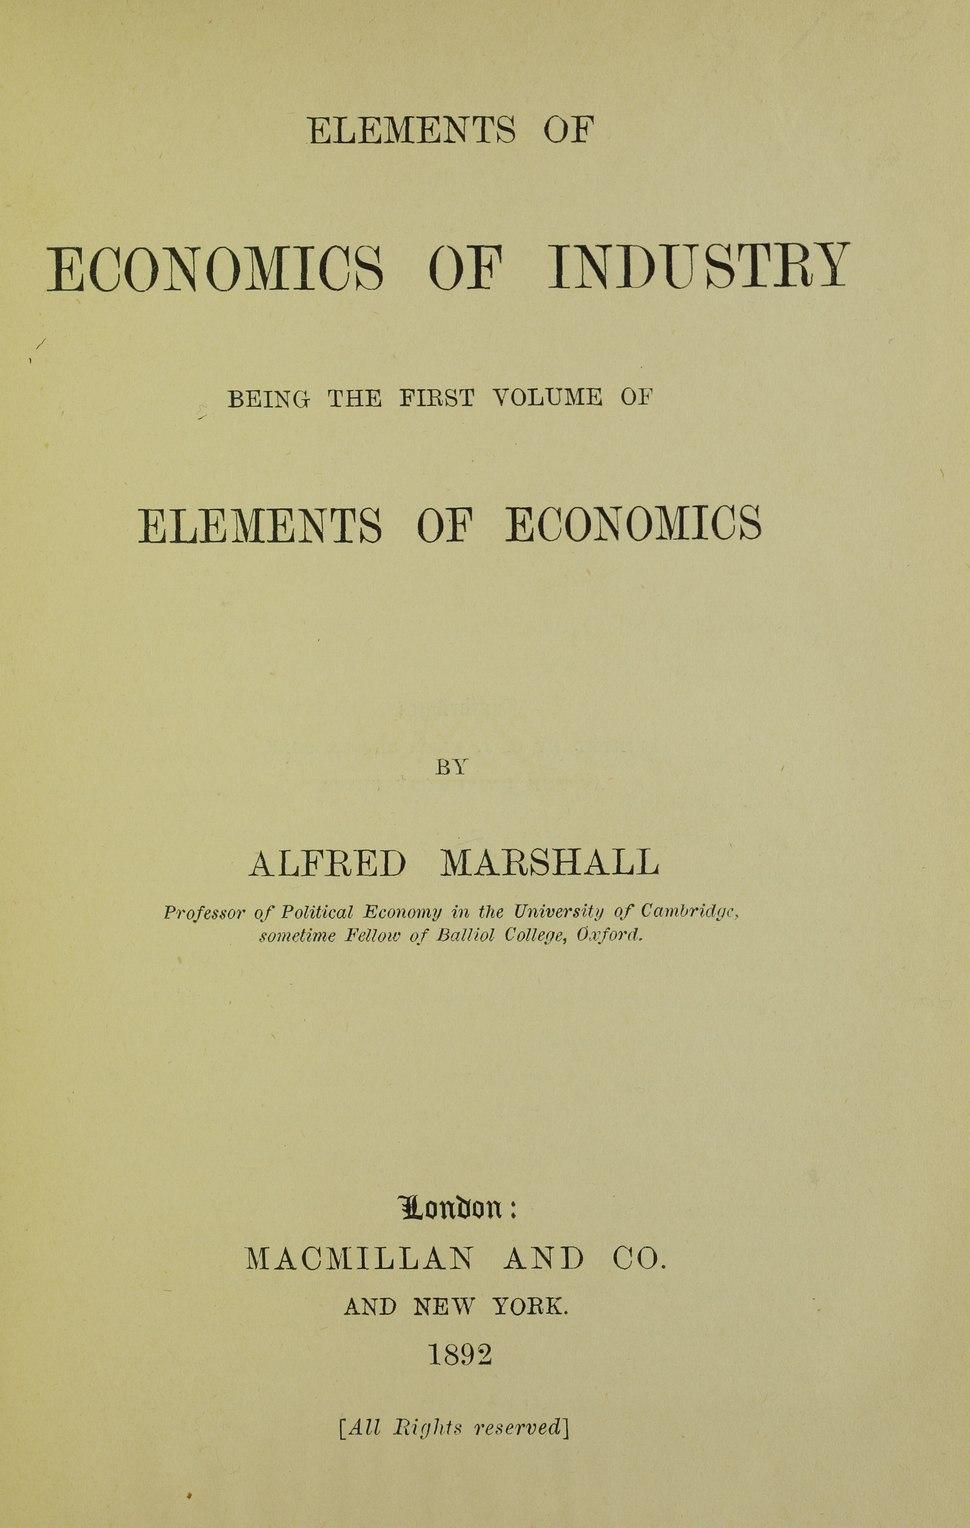 Marshall - Elements of economics of industry, 1892 - 5745225